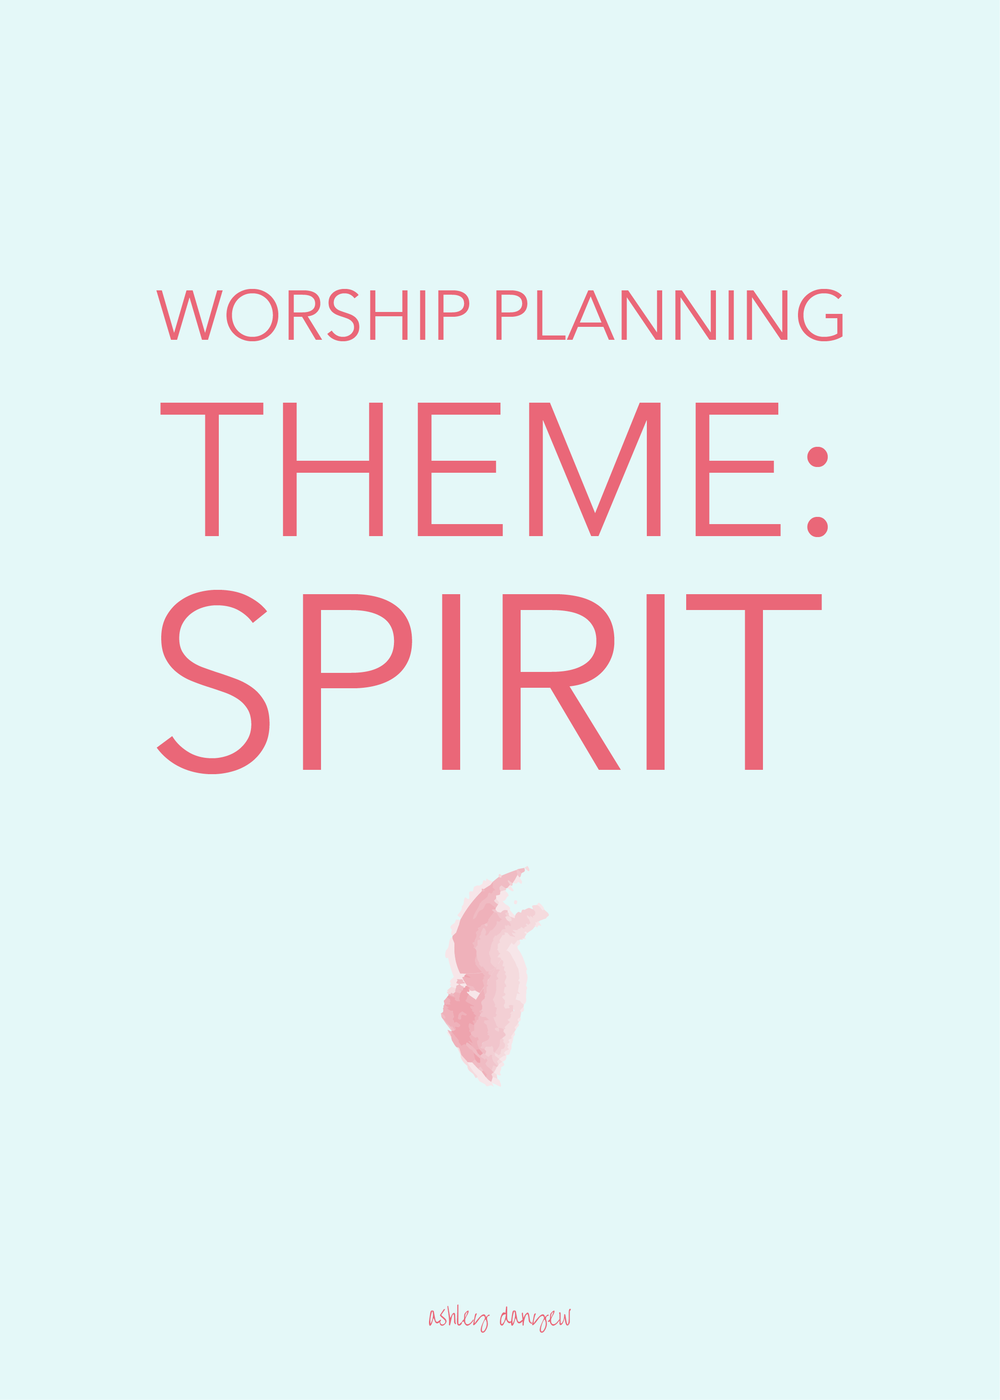 Copy of Worship Planning Theme: Spirit